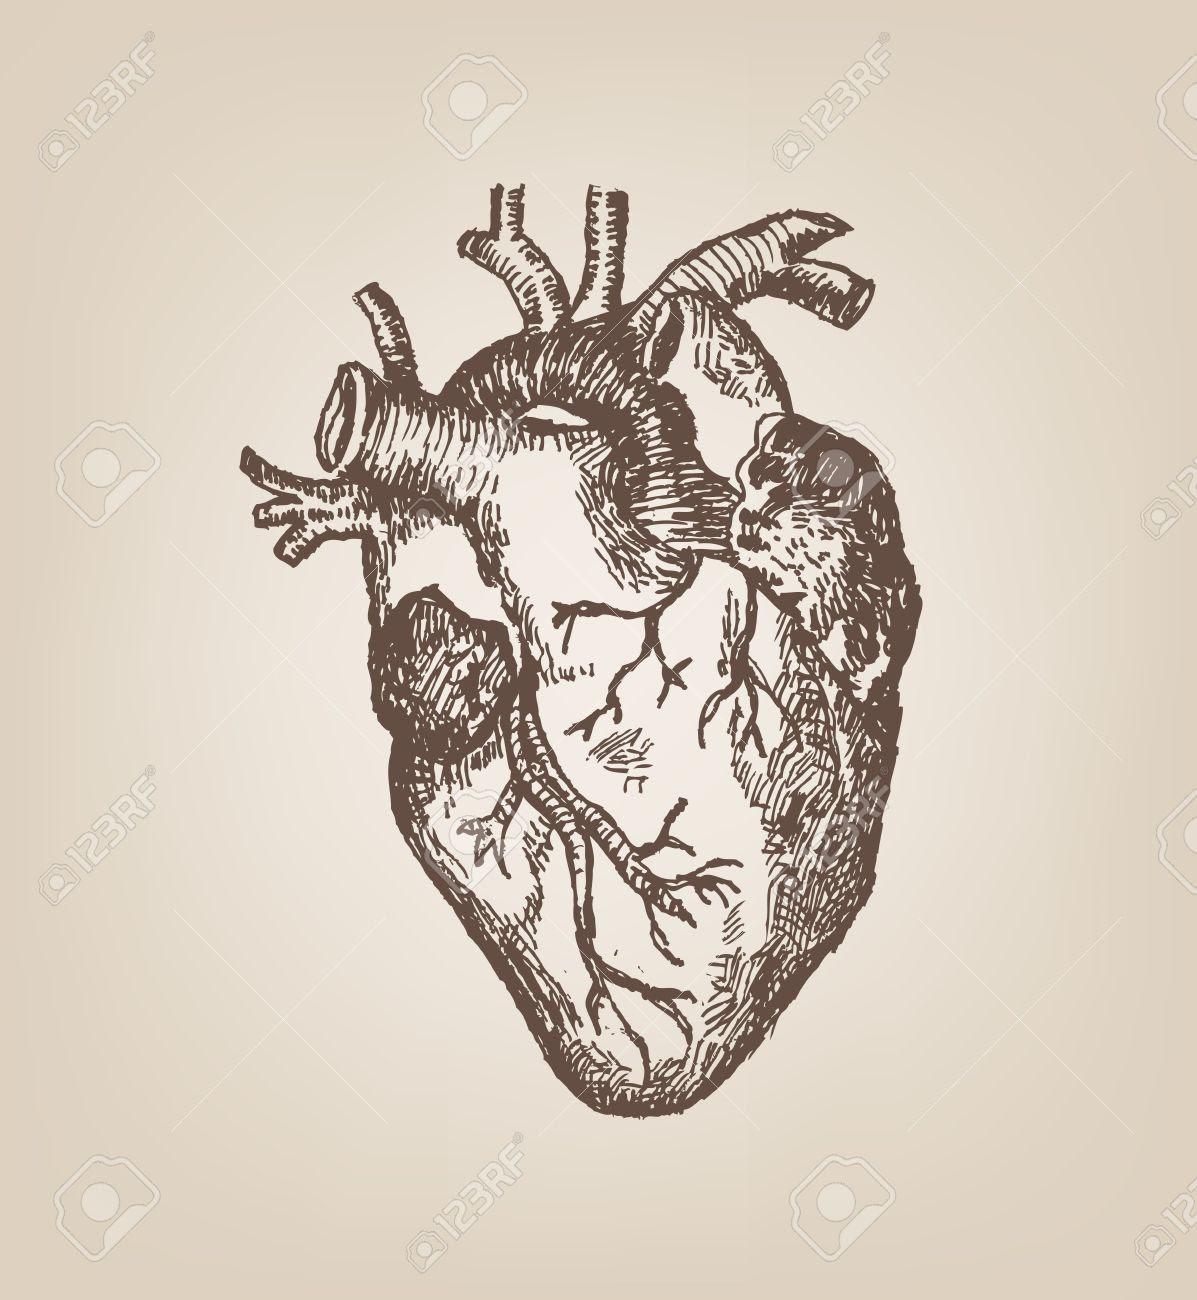 Human Heart Hand Sketch Style. Vintage Editable Clip Art. Royalty ...